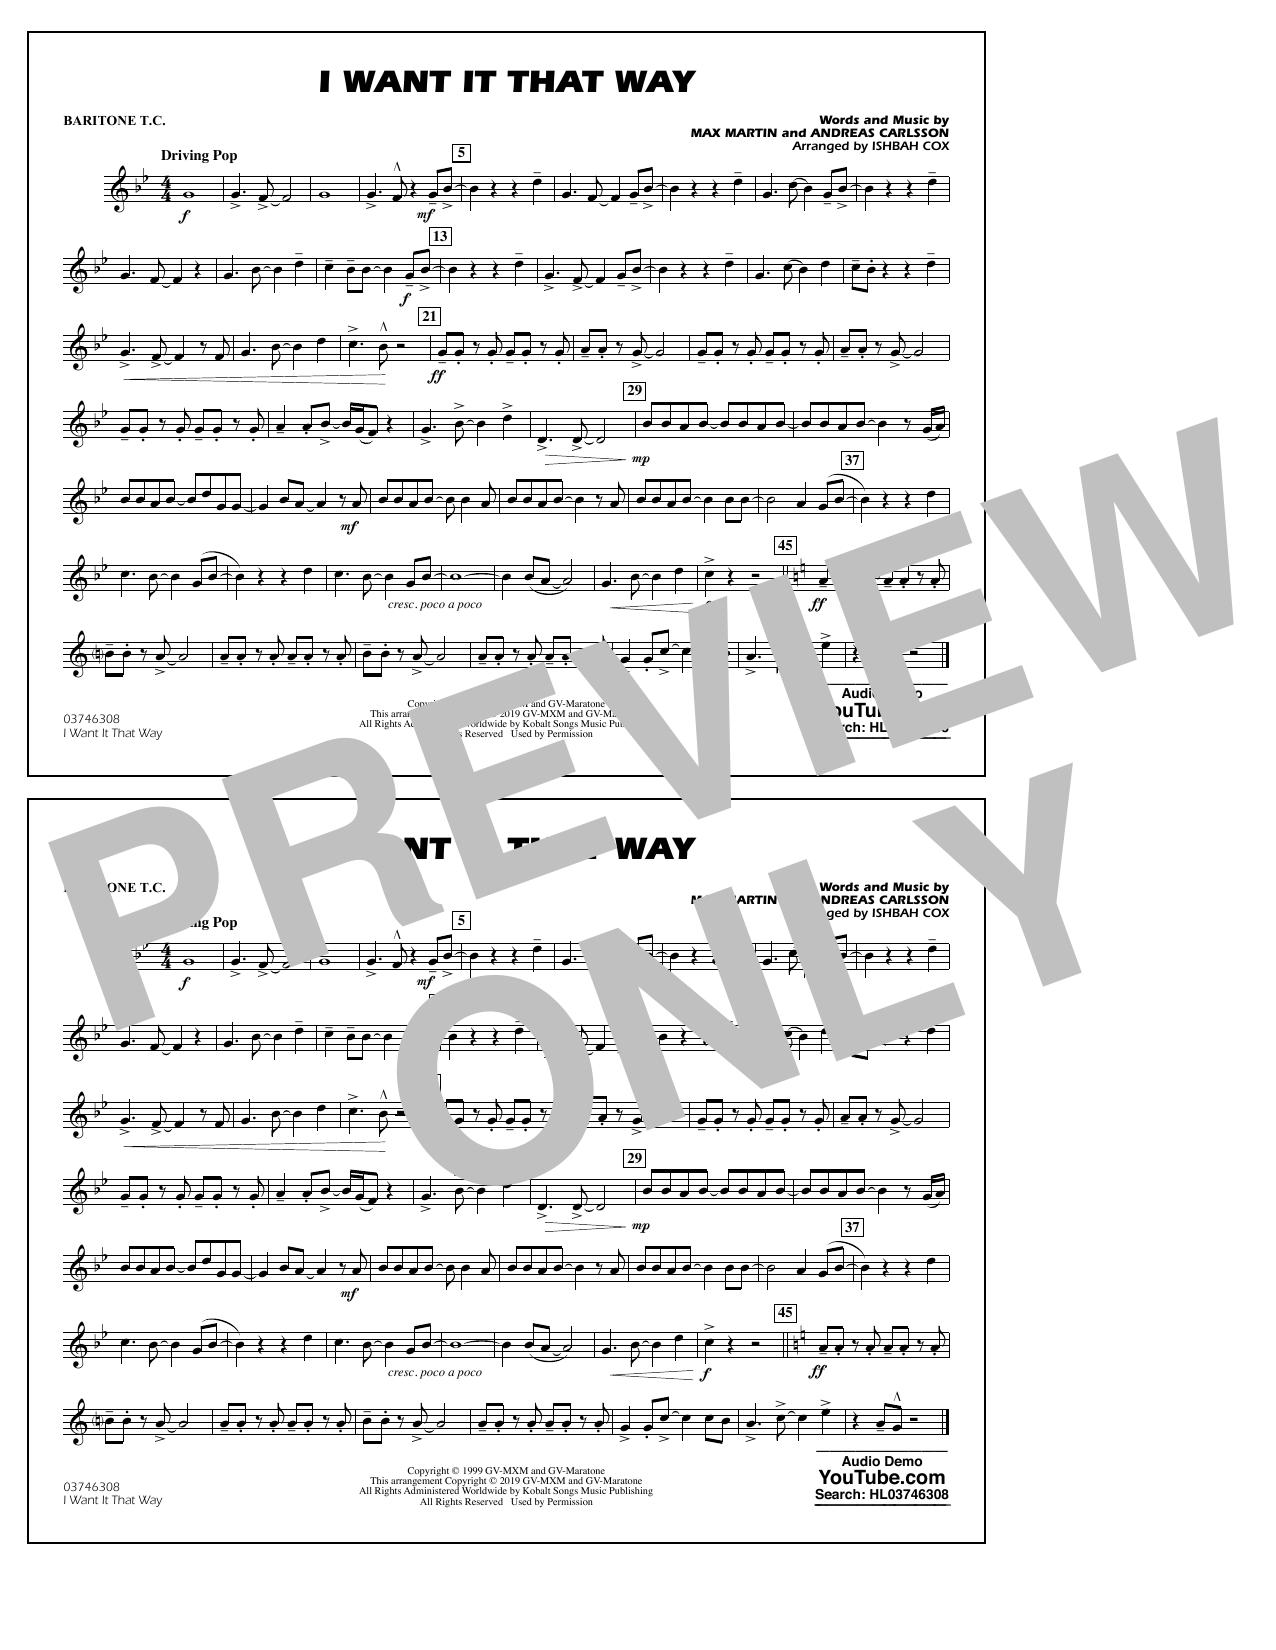 Backstreet Boys I Want It That Way (arr. Ishbah Cox) - Baritone T.C. sheet music notes and chords. Download Printable PDF.